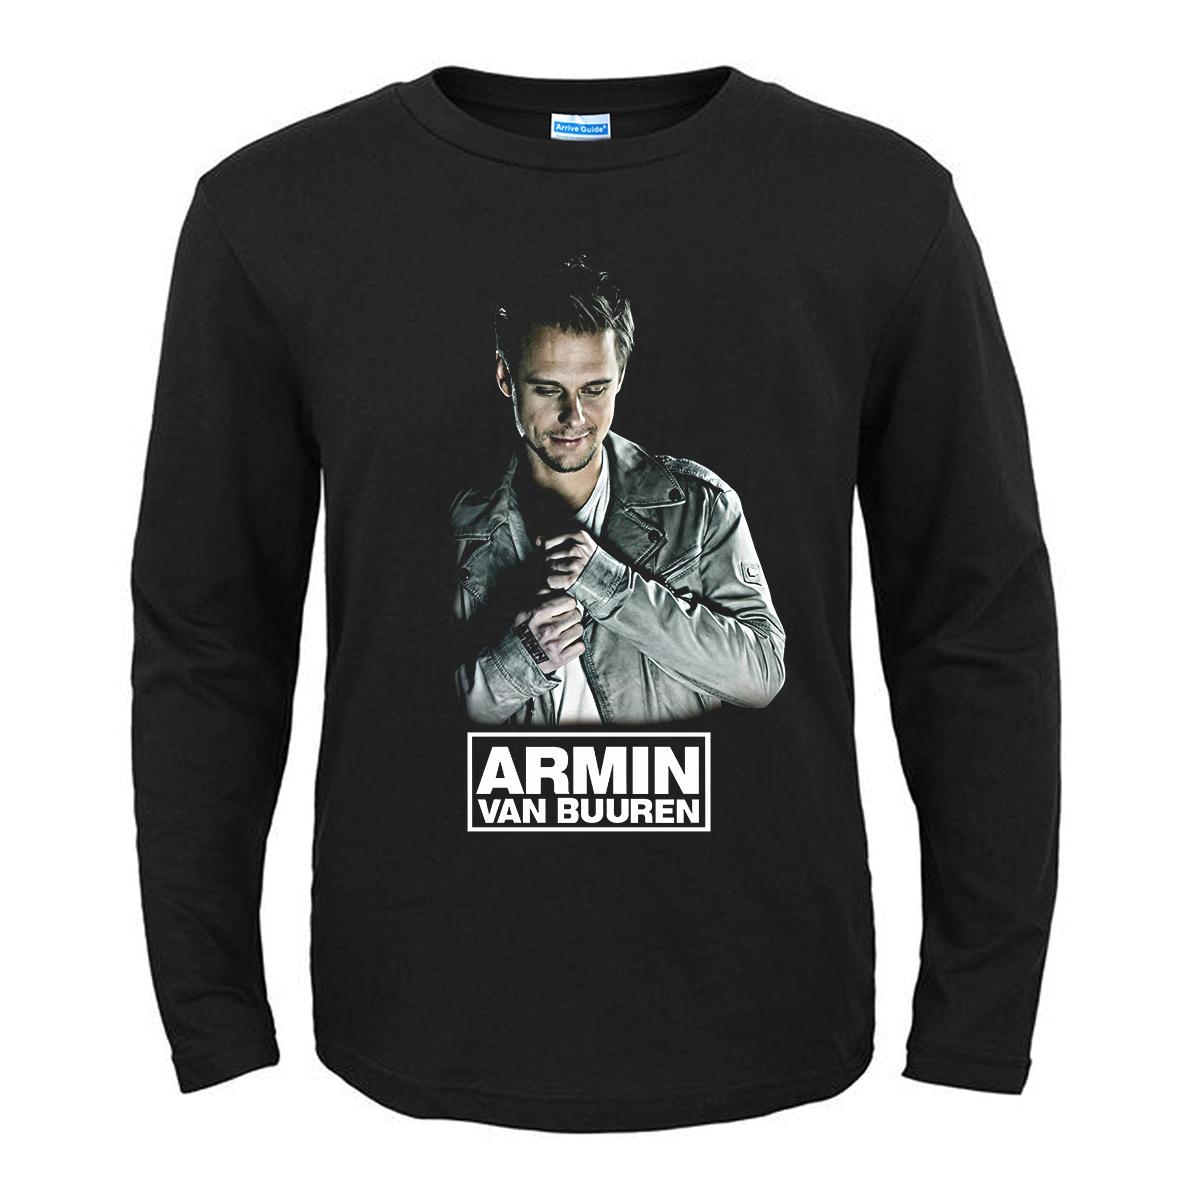 Merch T-Shirt Armin Van Buuren Black